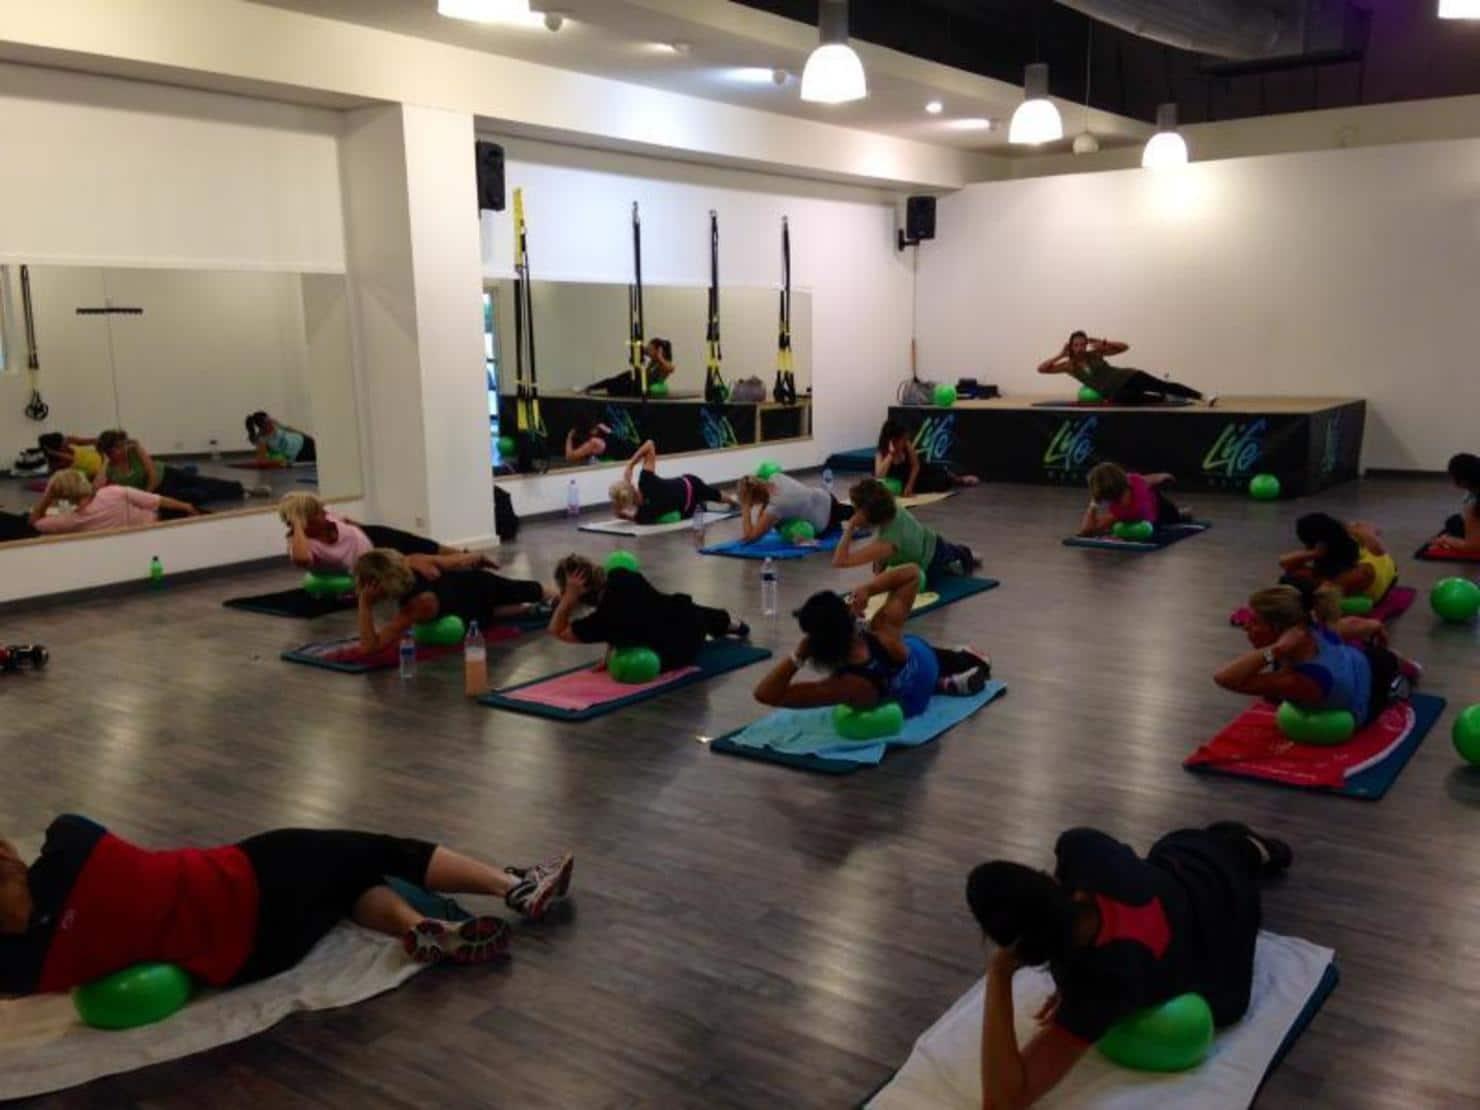 Salle de Fitness Avignon Lifeclub